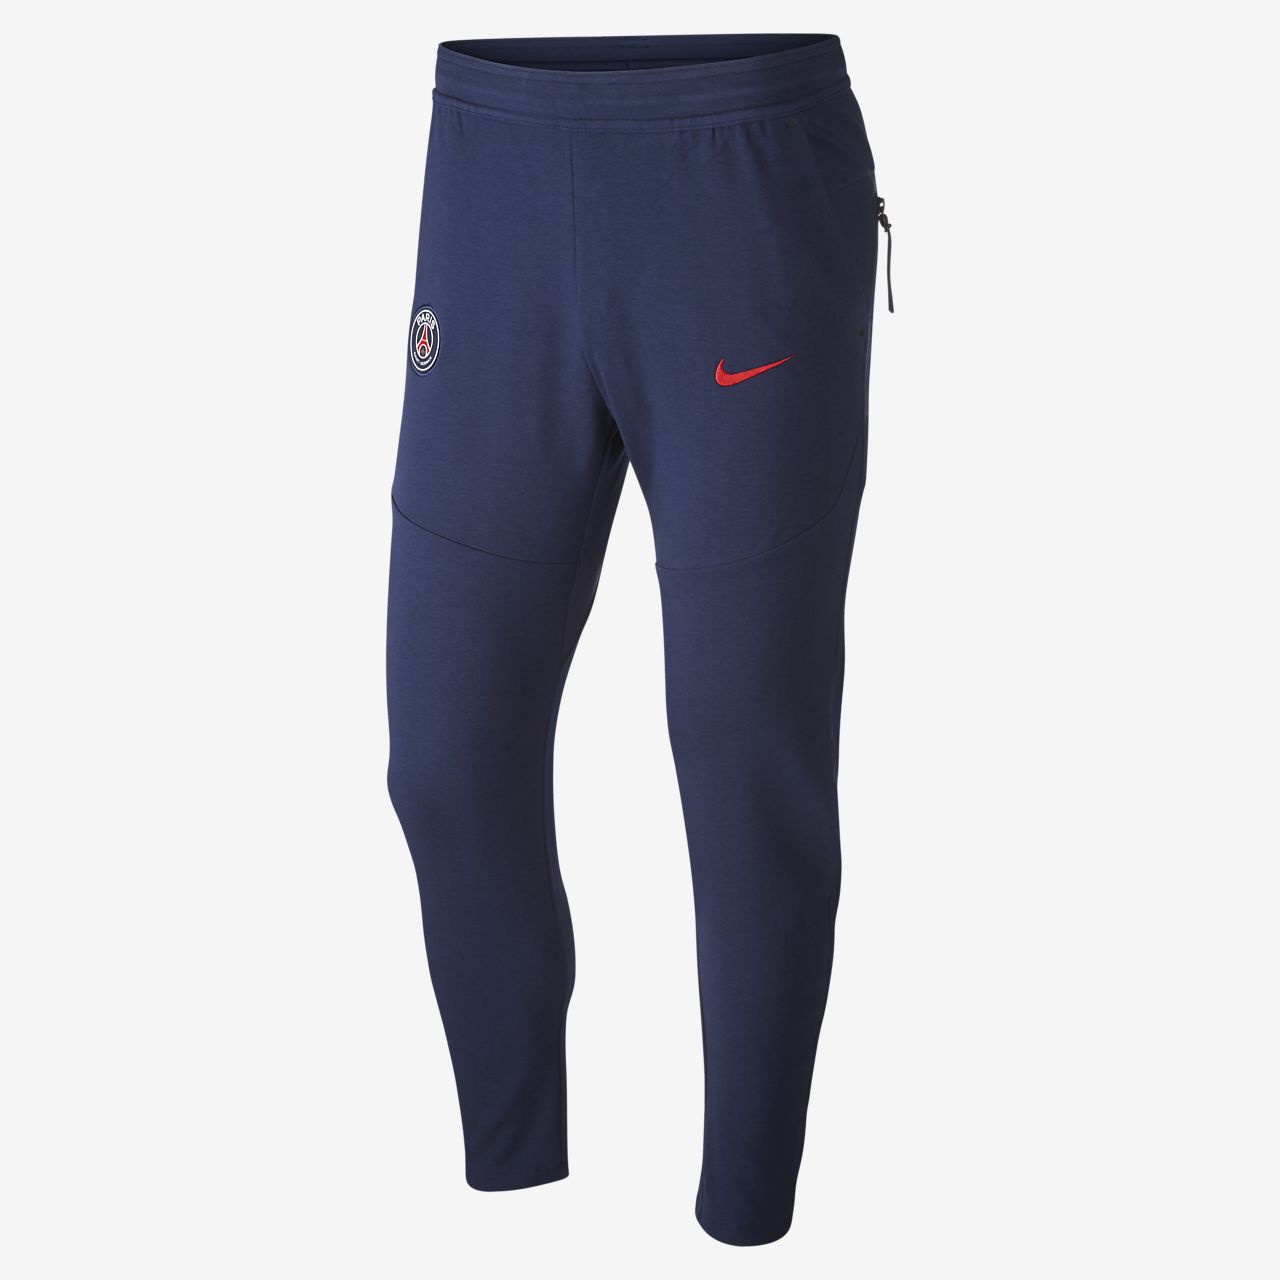 Pantalones para hombre Paris Saint-Germain Tech Pack